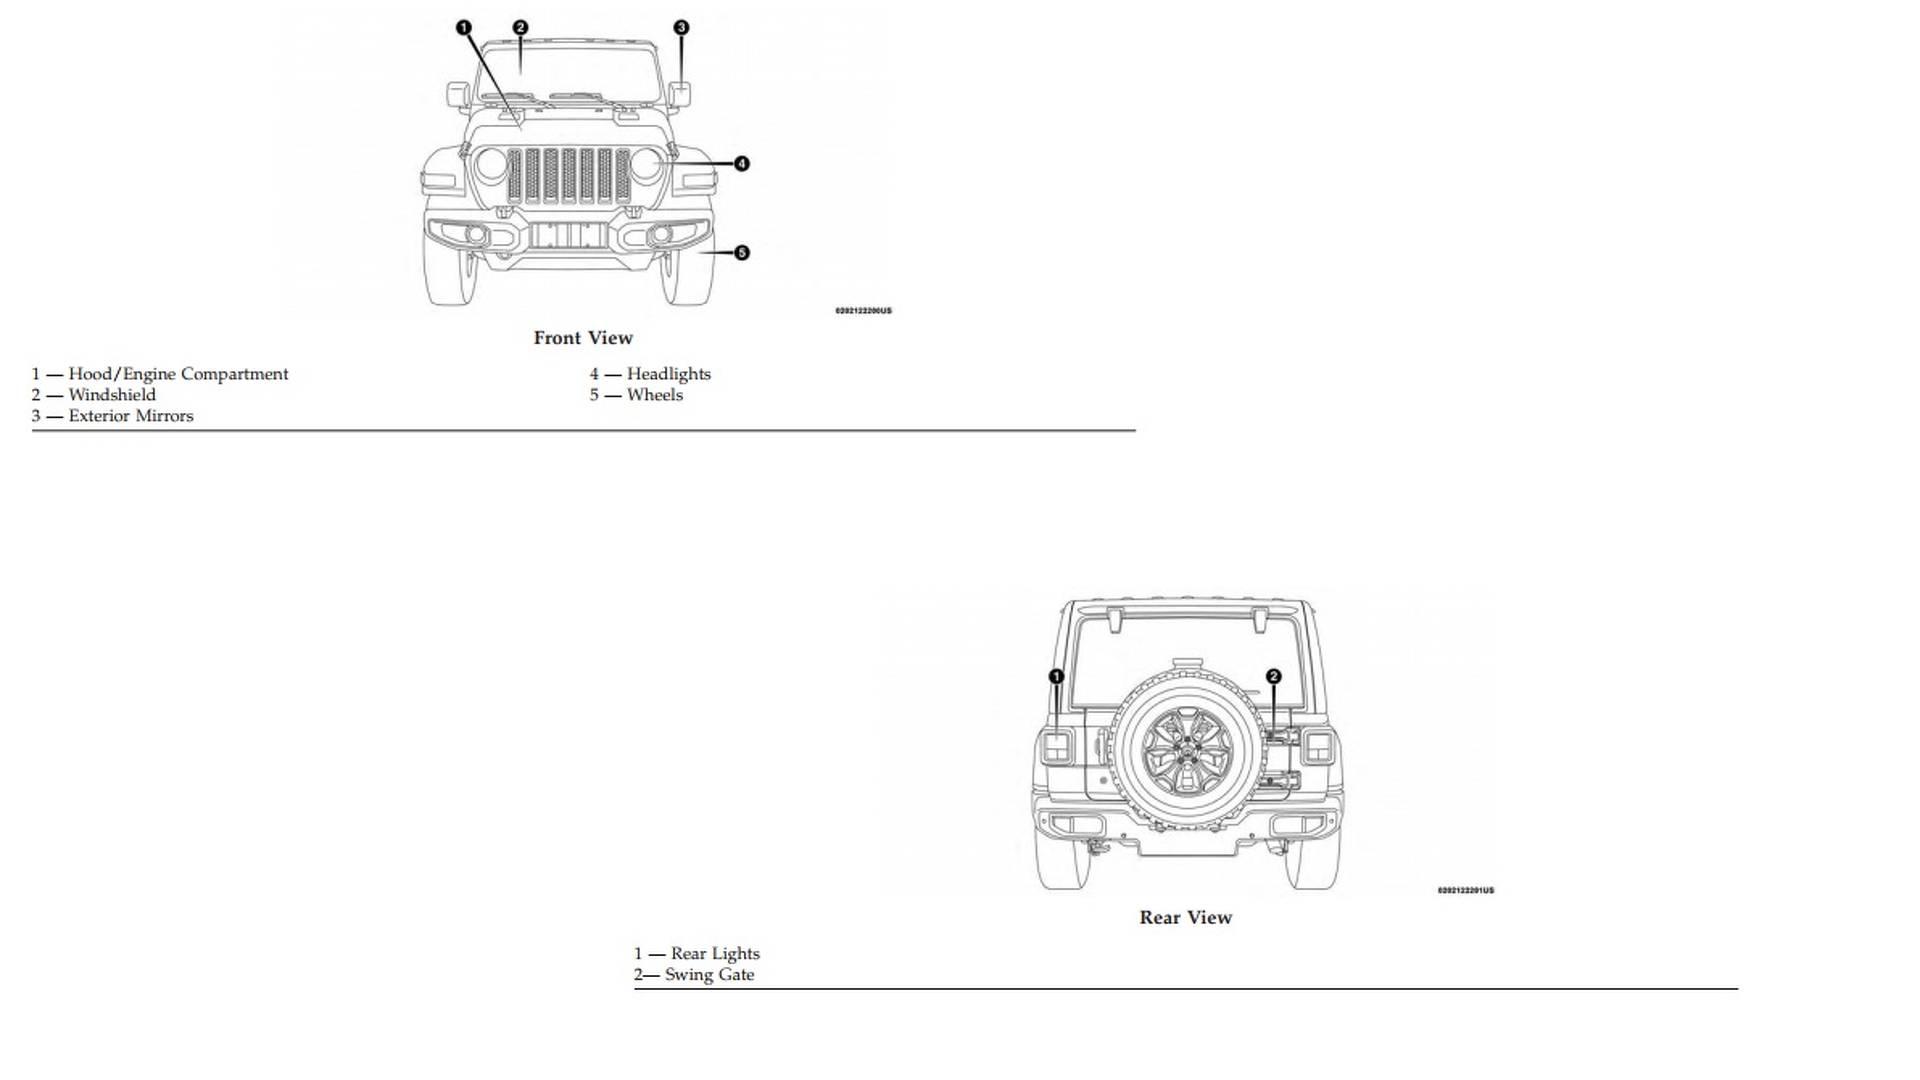 1991 toyota pickup starter wiring diagram for 220 volt outlet previa engine html imageresizertool com